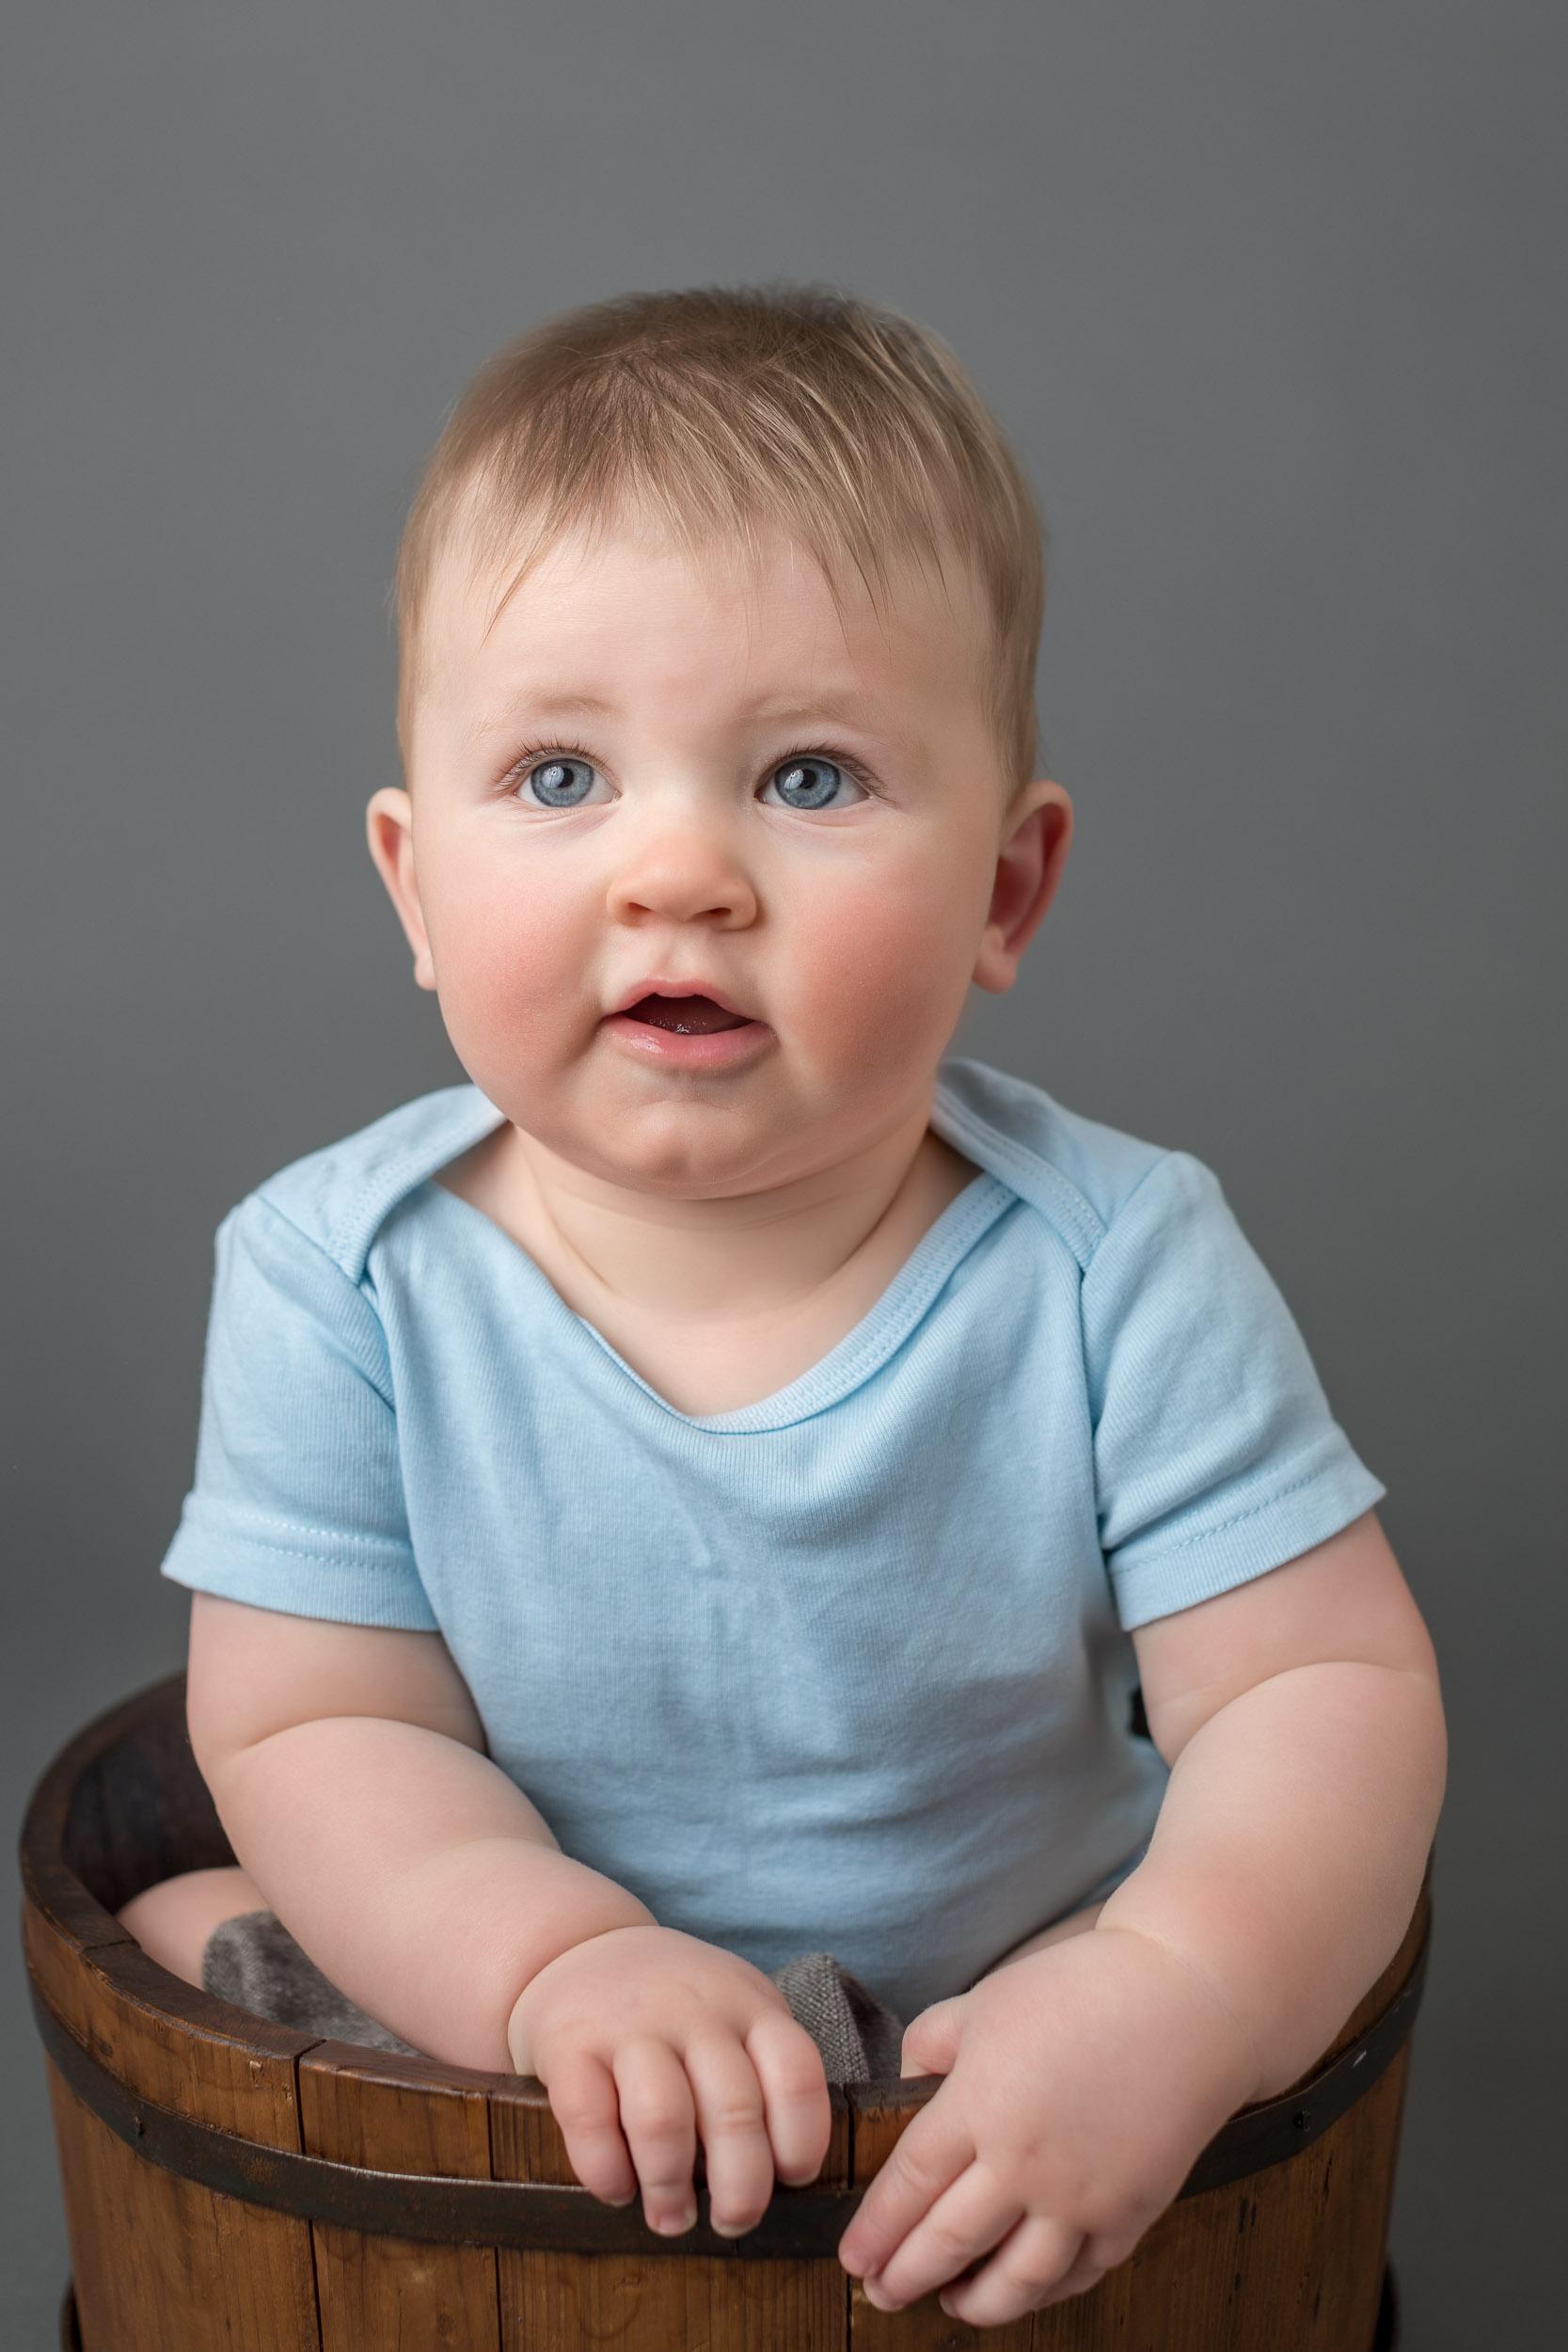 NYC_baby_portraits_UWS_John-26.jpg